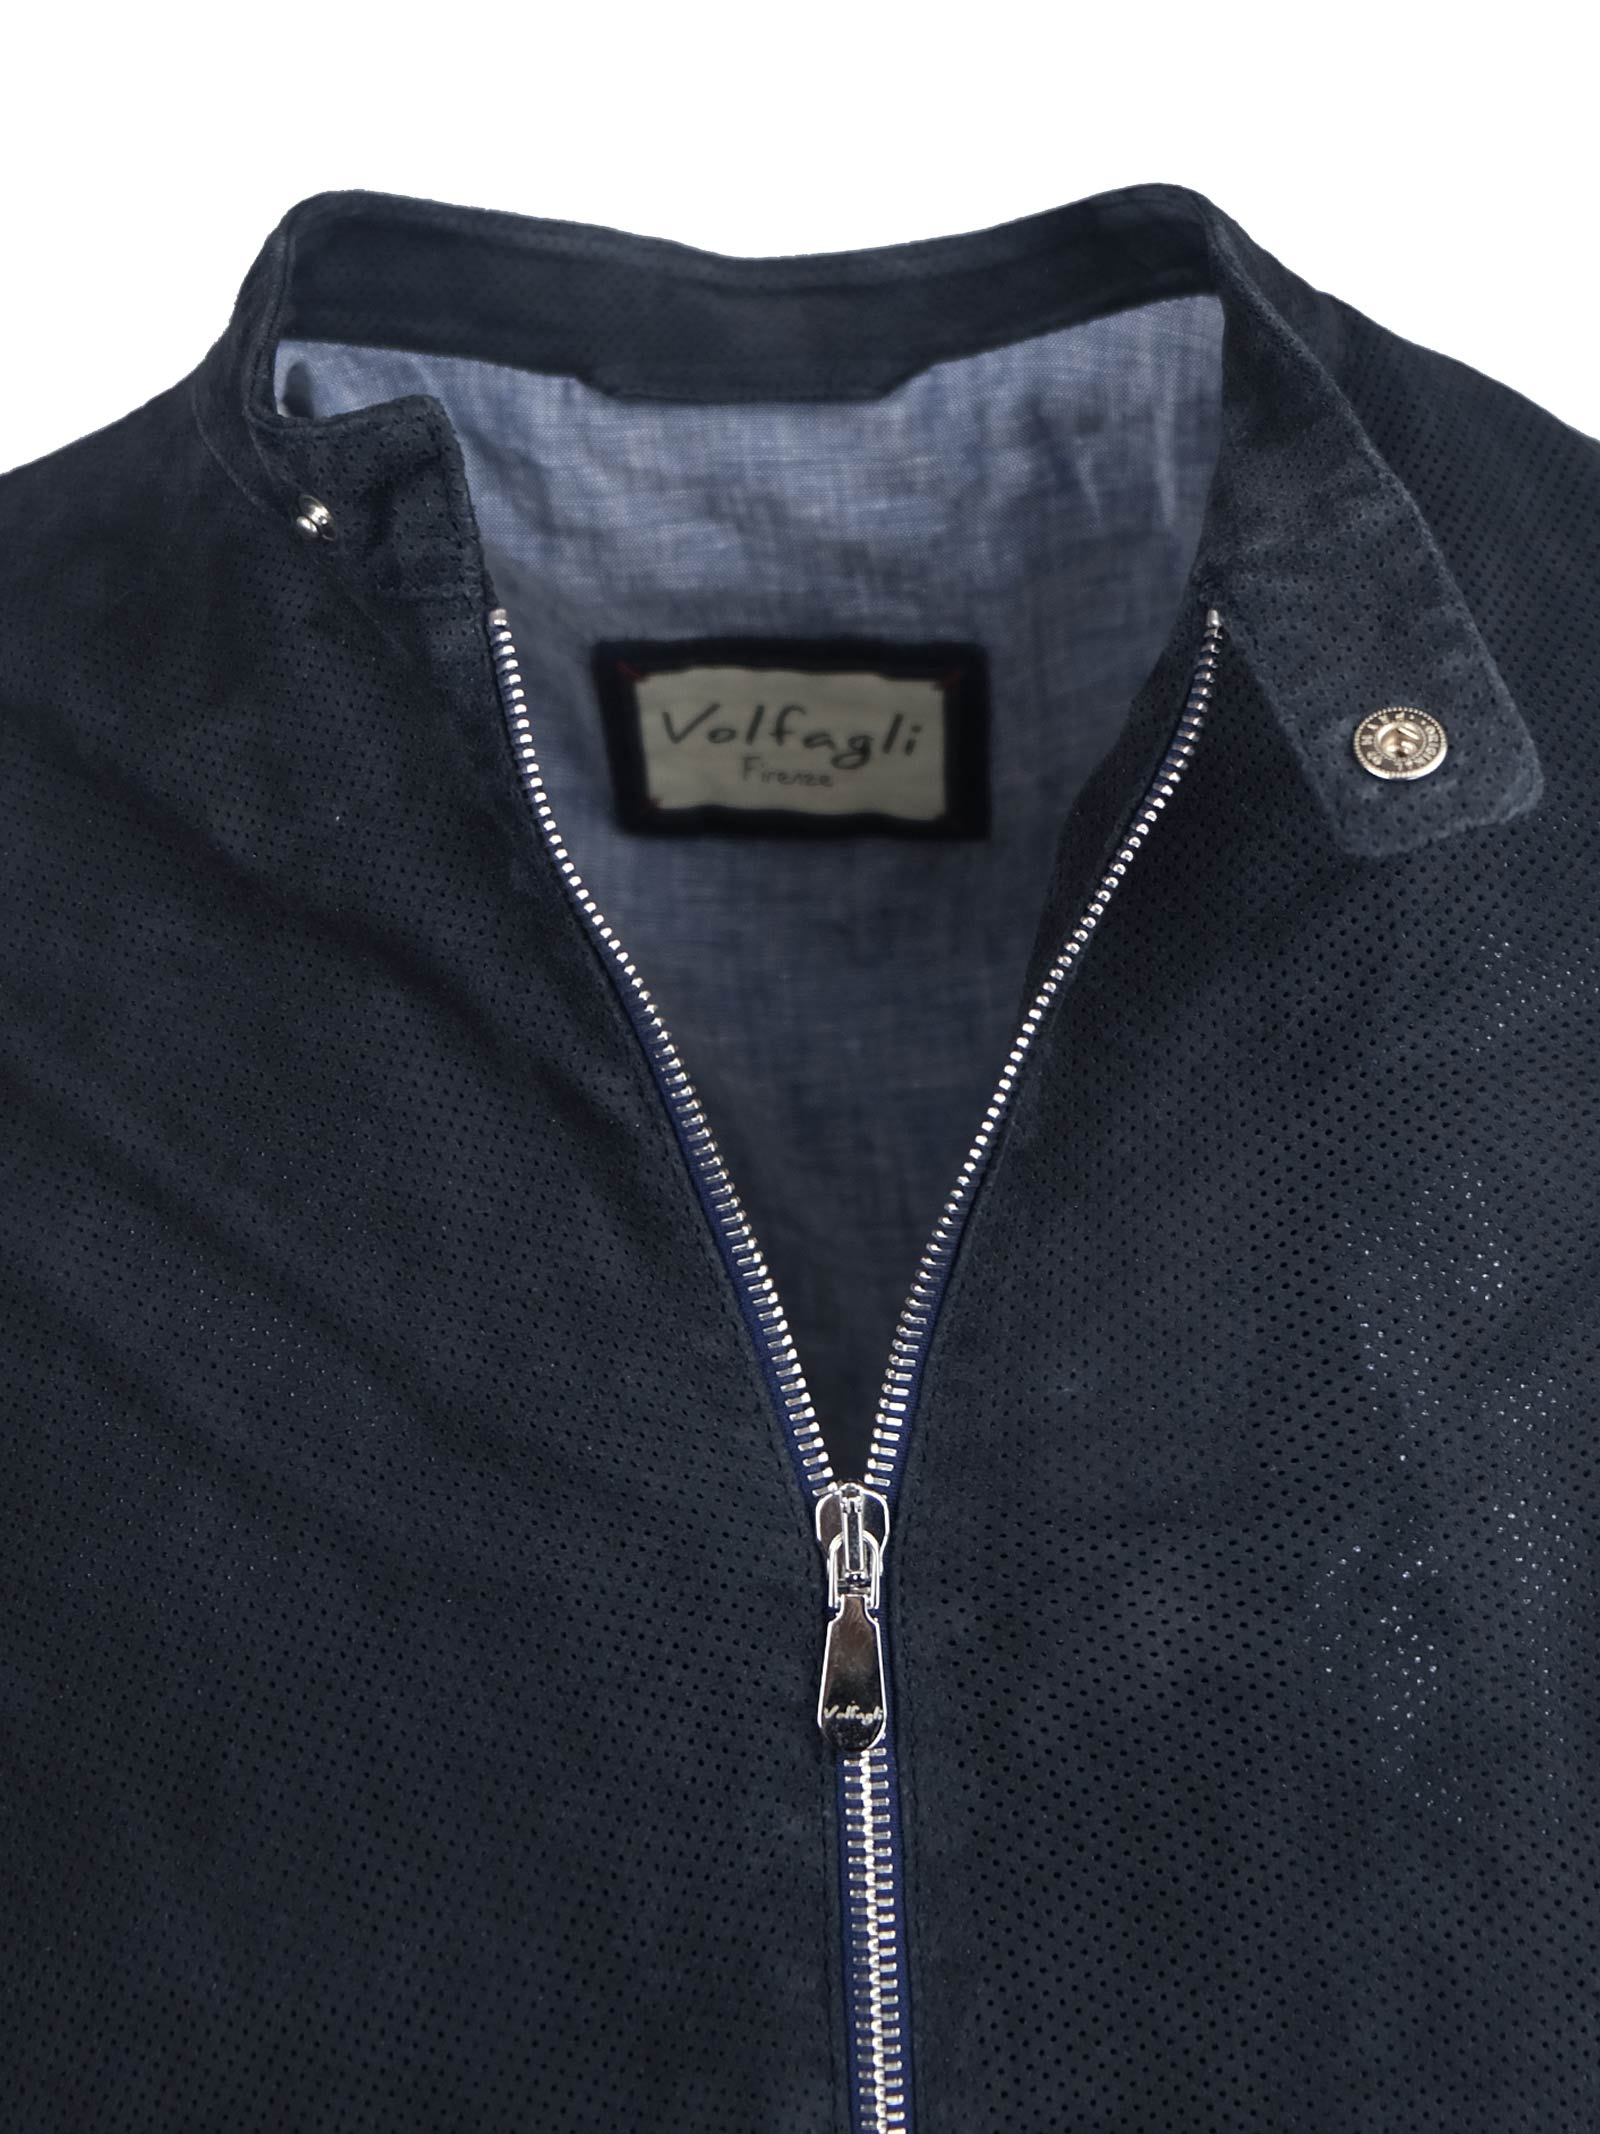 MICRO PERFORATED SUPERFINE SUEDE JACKET SLIM FIT Volfagli | Jackets | CRACCO QBLU